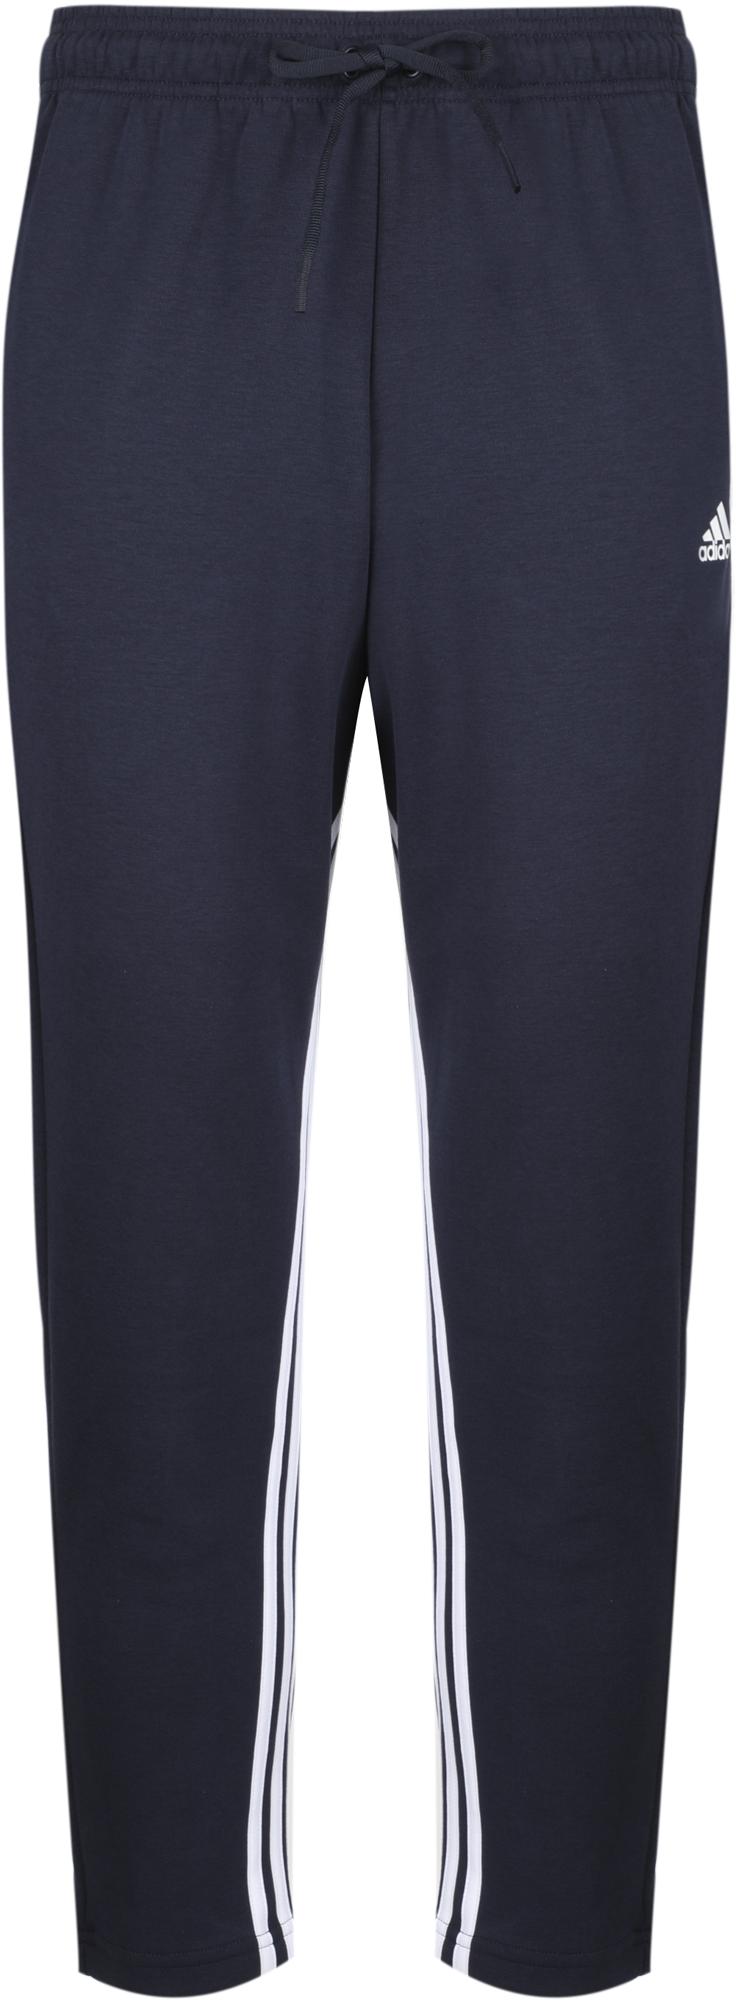 цена Adidas Брюки мужские Adidas Must Haves 3-Stripes, размер 60-62 онлайн в 2017 году